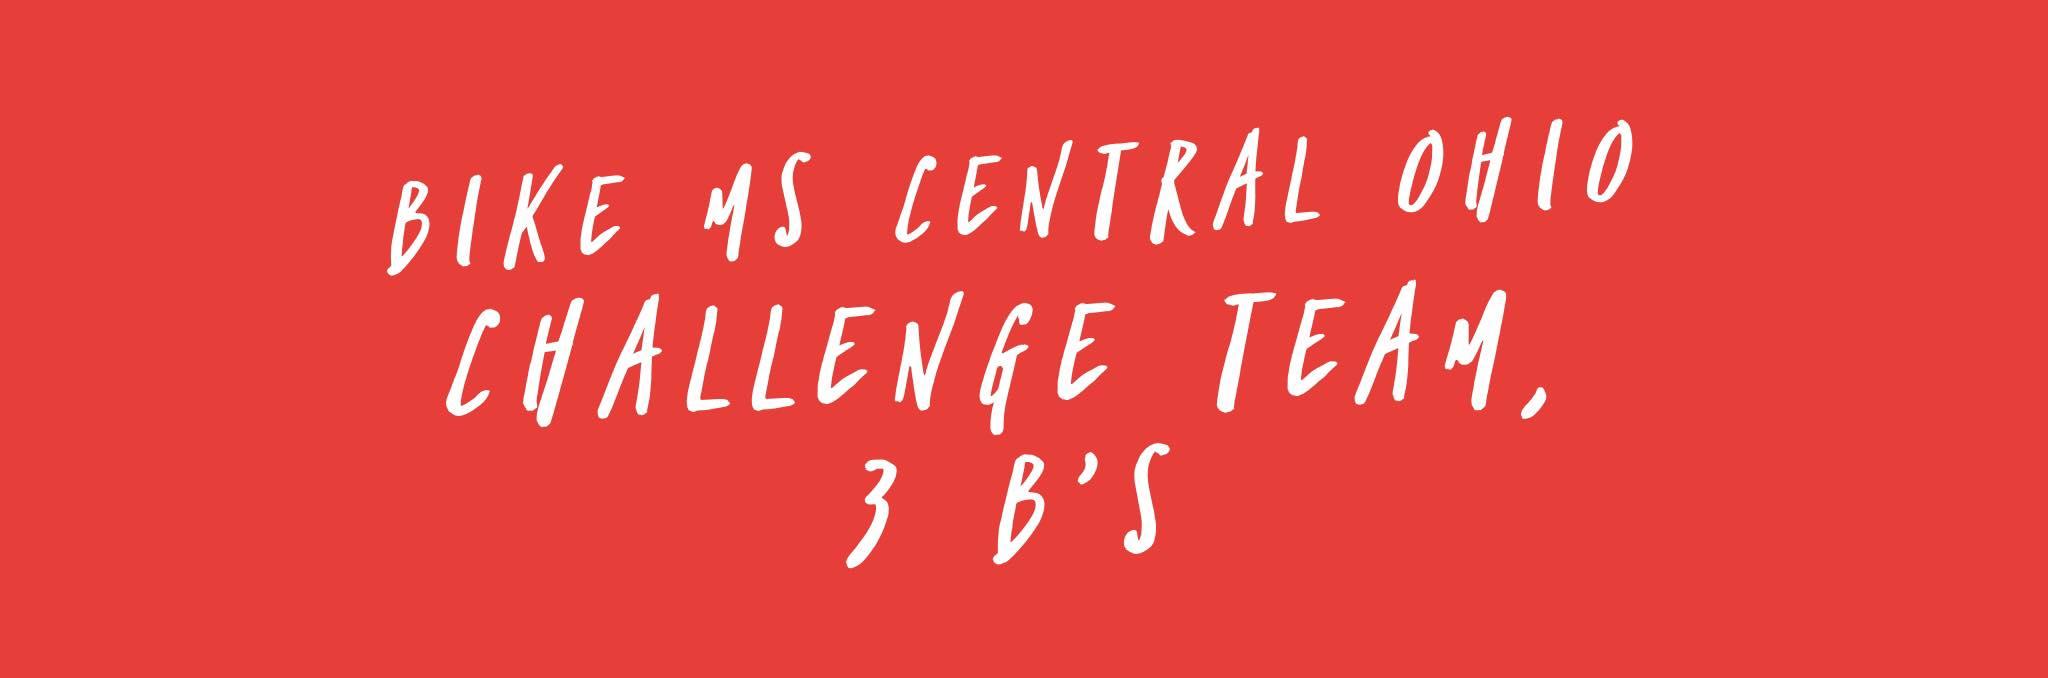 BIKE MS CENTRAL OHIO CHALLENGE TEAM 3 B'S